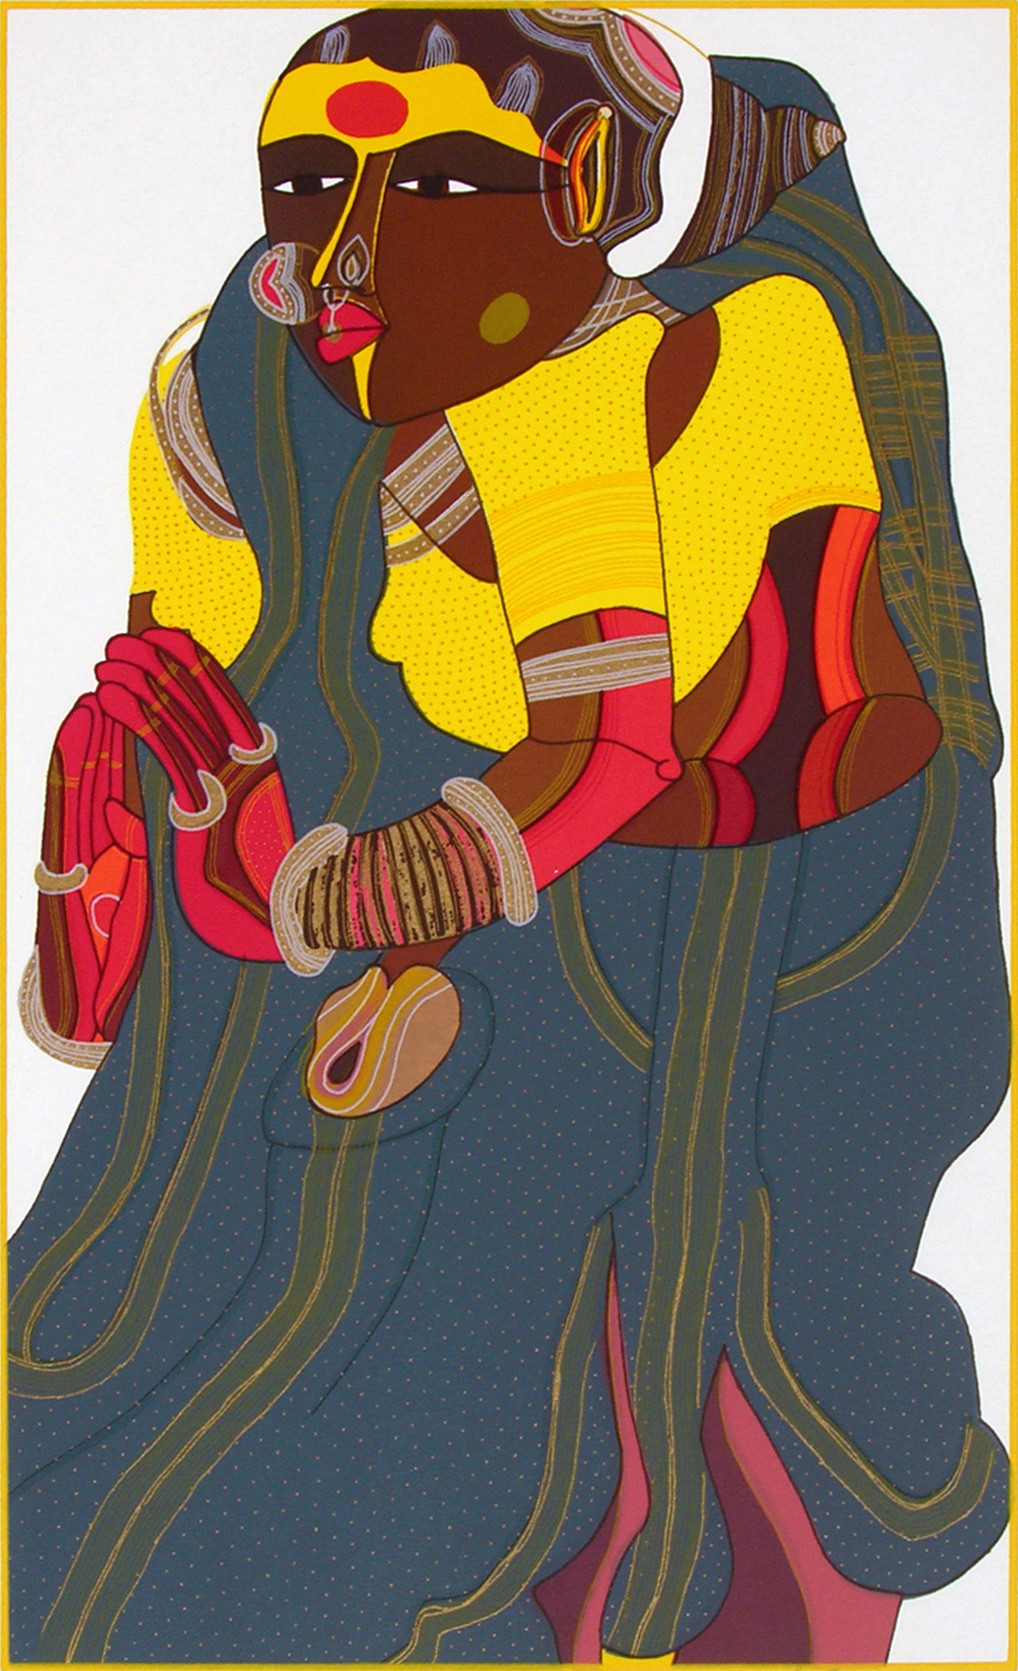 Telangana Woman - IV by Thota Vaikuntam, Expressionism Printmaking, Serigraph on Paper, Brown color